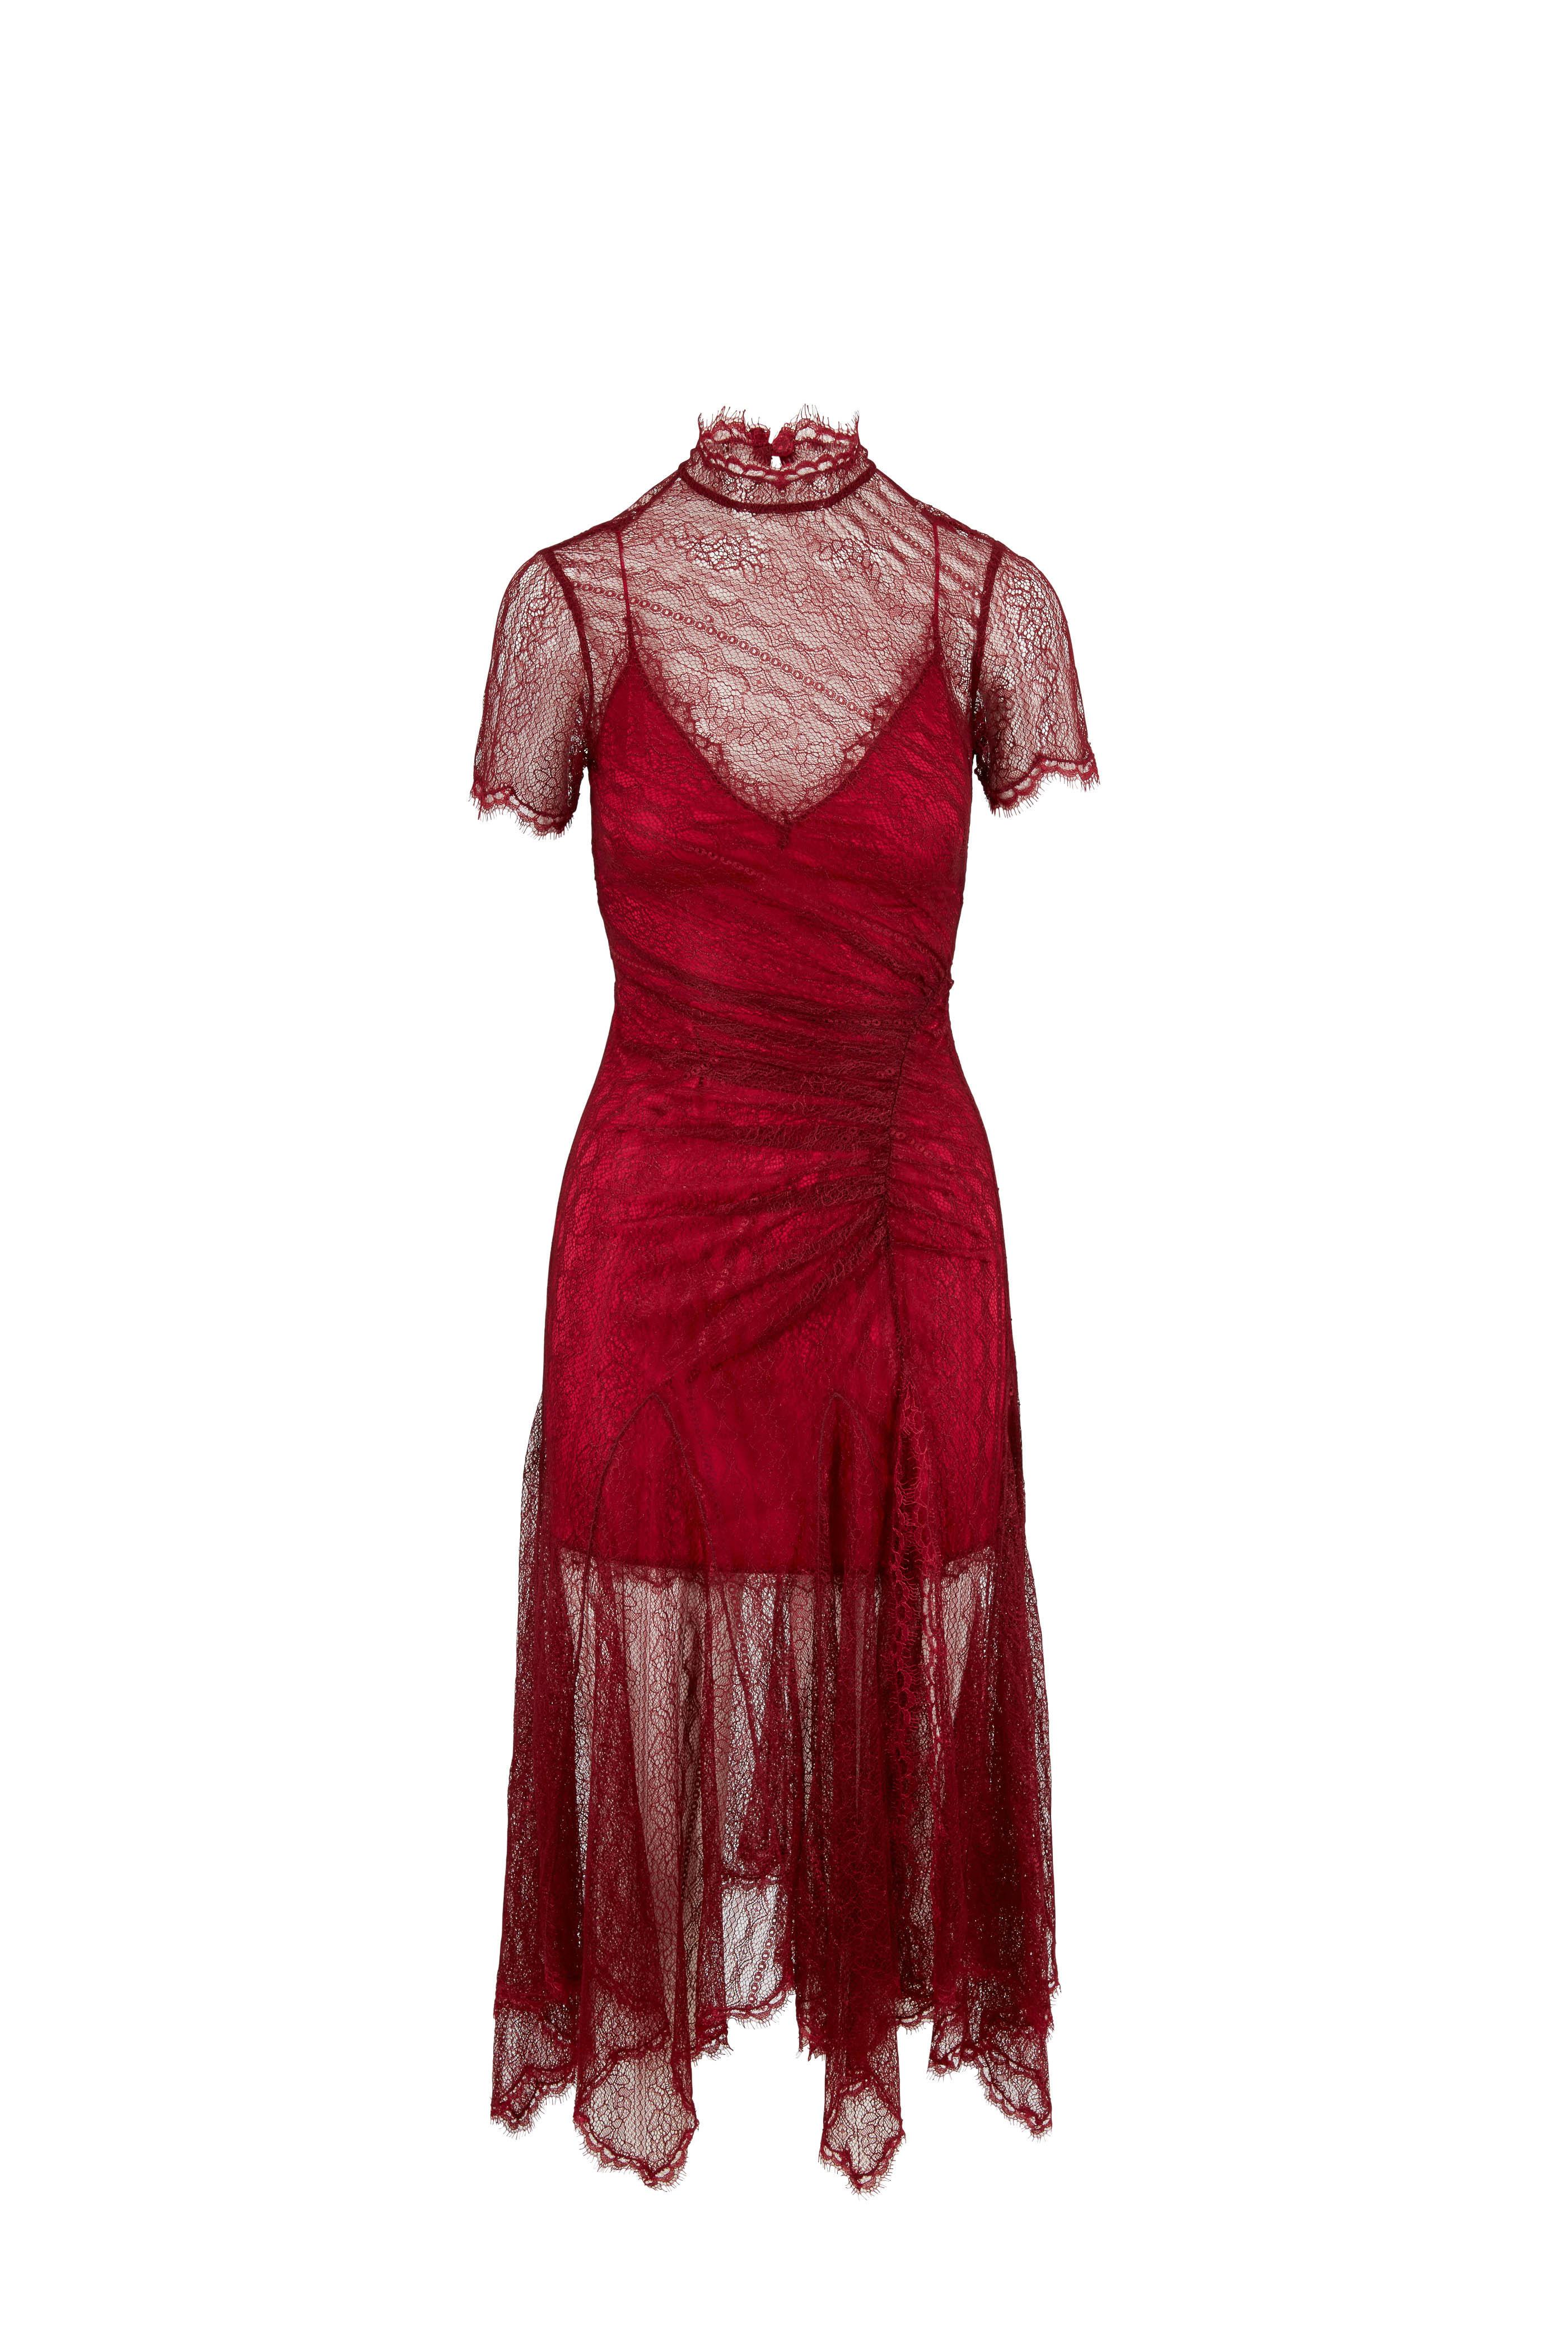 47063a41b8a Jonathan Simkhai - Siren Red Satin Lace Short Sleeve Dress ...